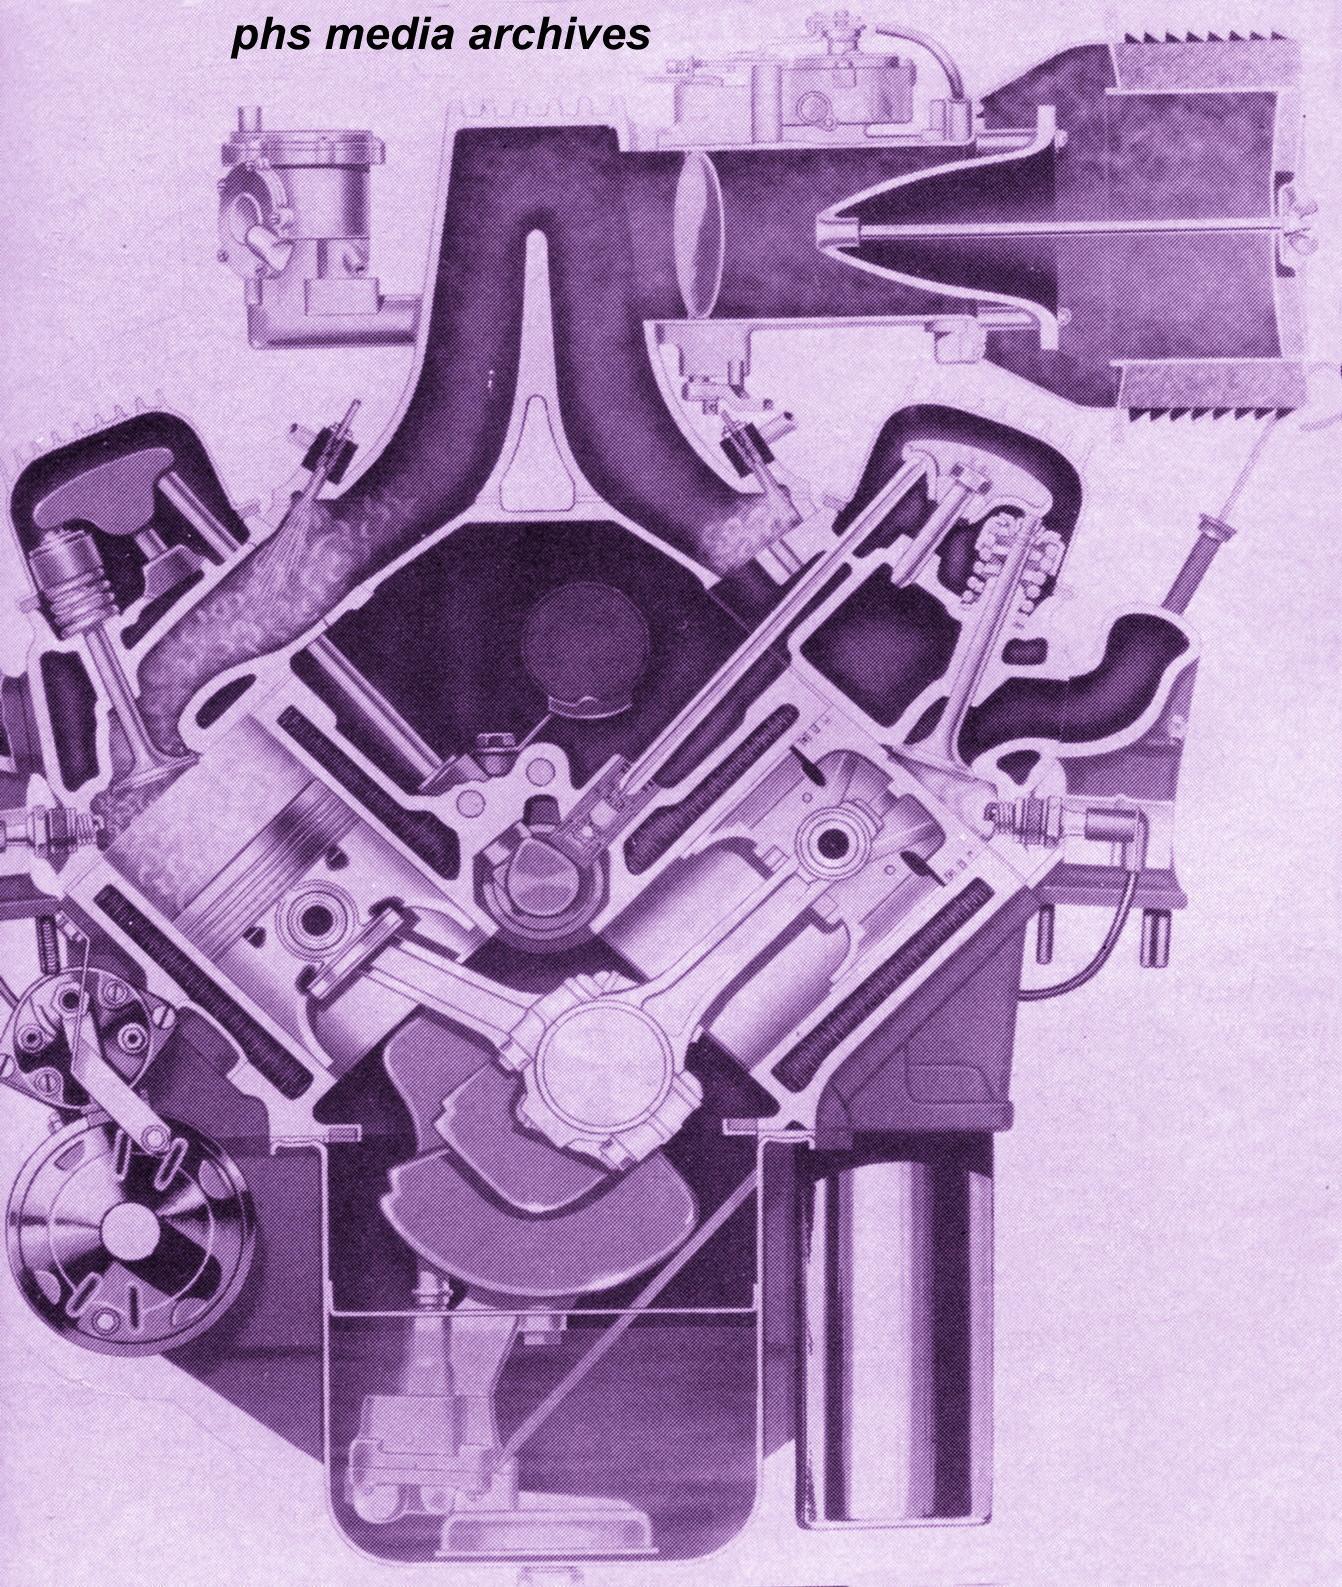 Bp Wiring Harness Auto Electrical Diagram Gm C6500 Clip Strap Efi Magazine Engine One Member